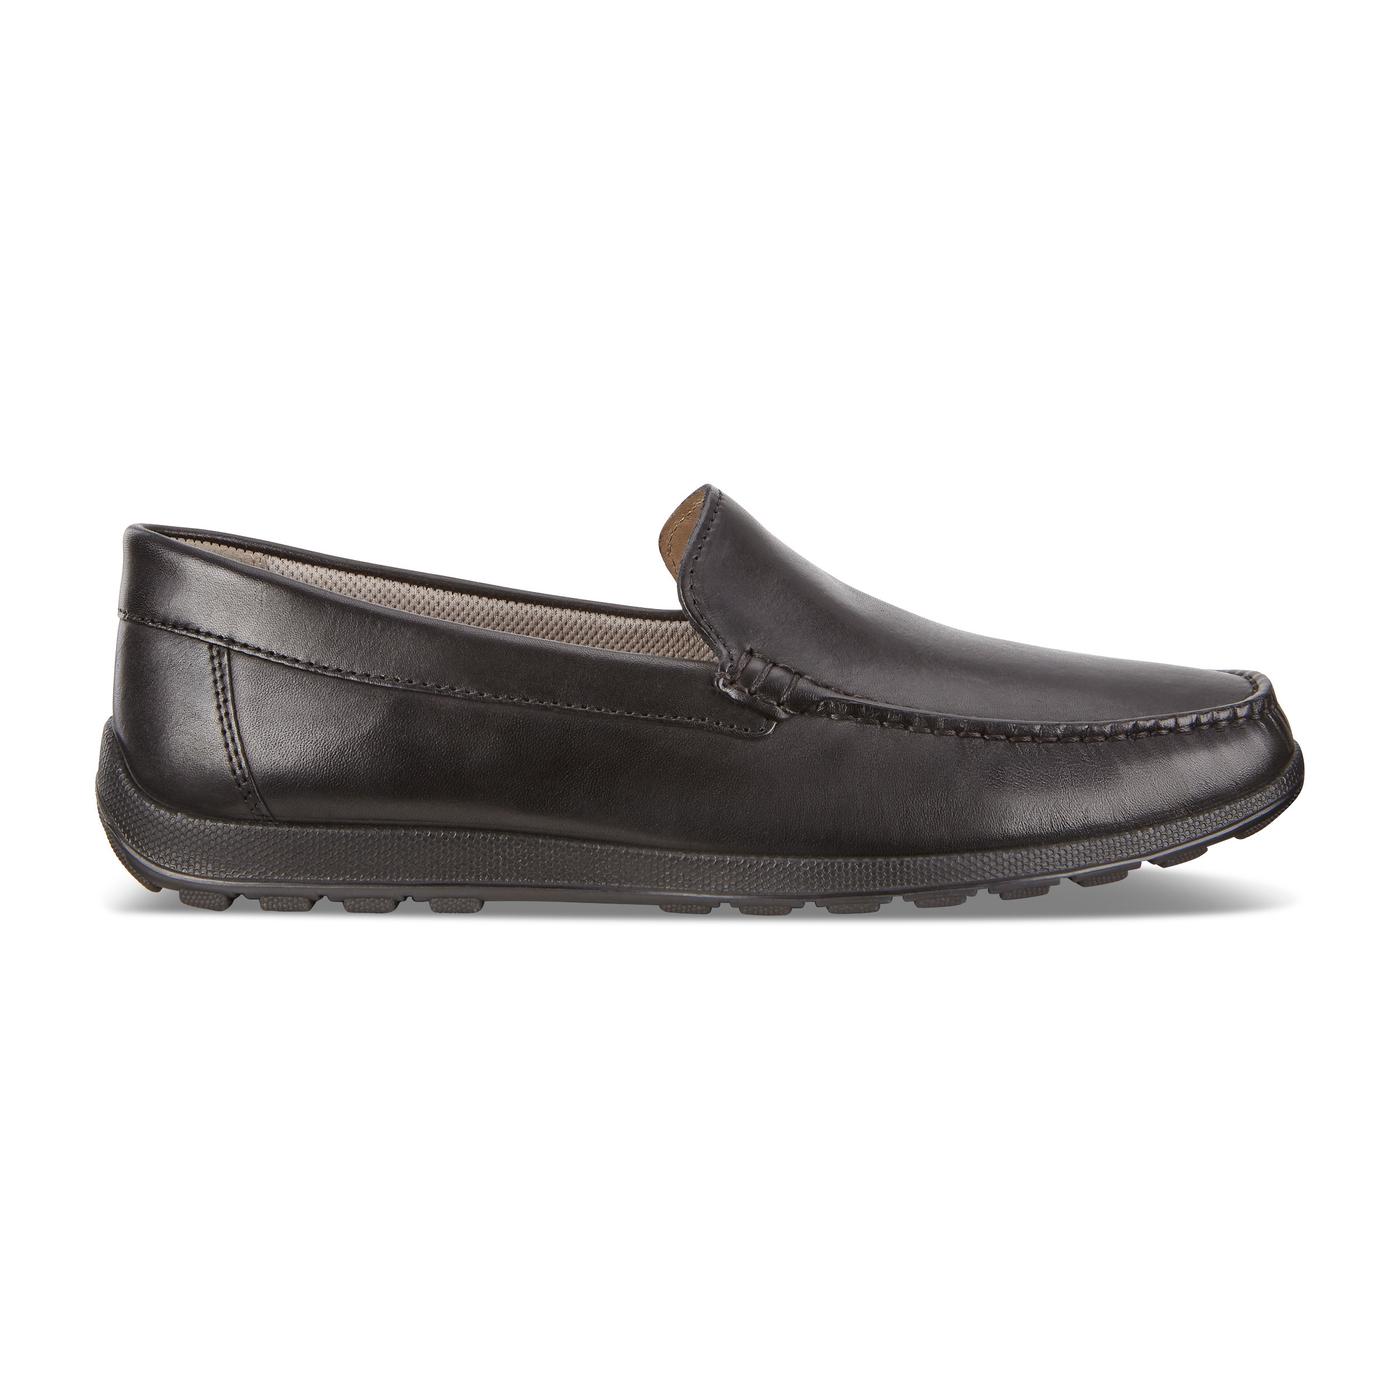 Ecco Flash Sale: Men's Reciprico Moccasin Slip on Shoes